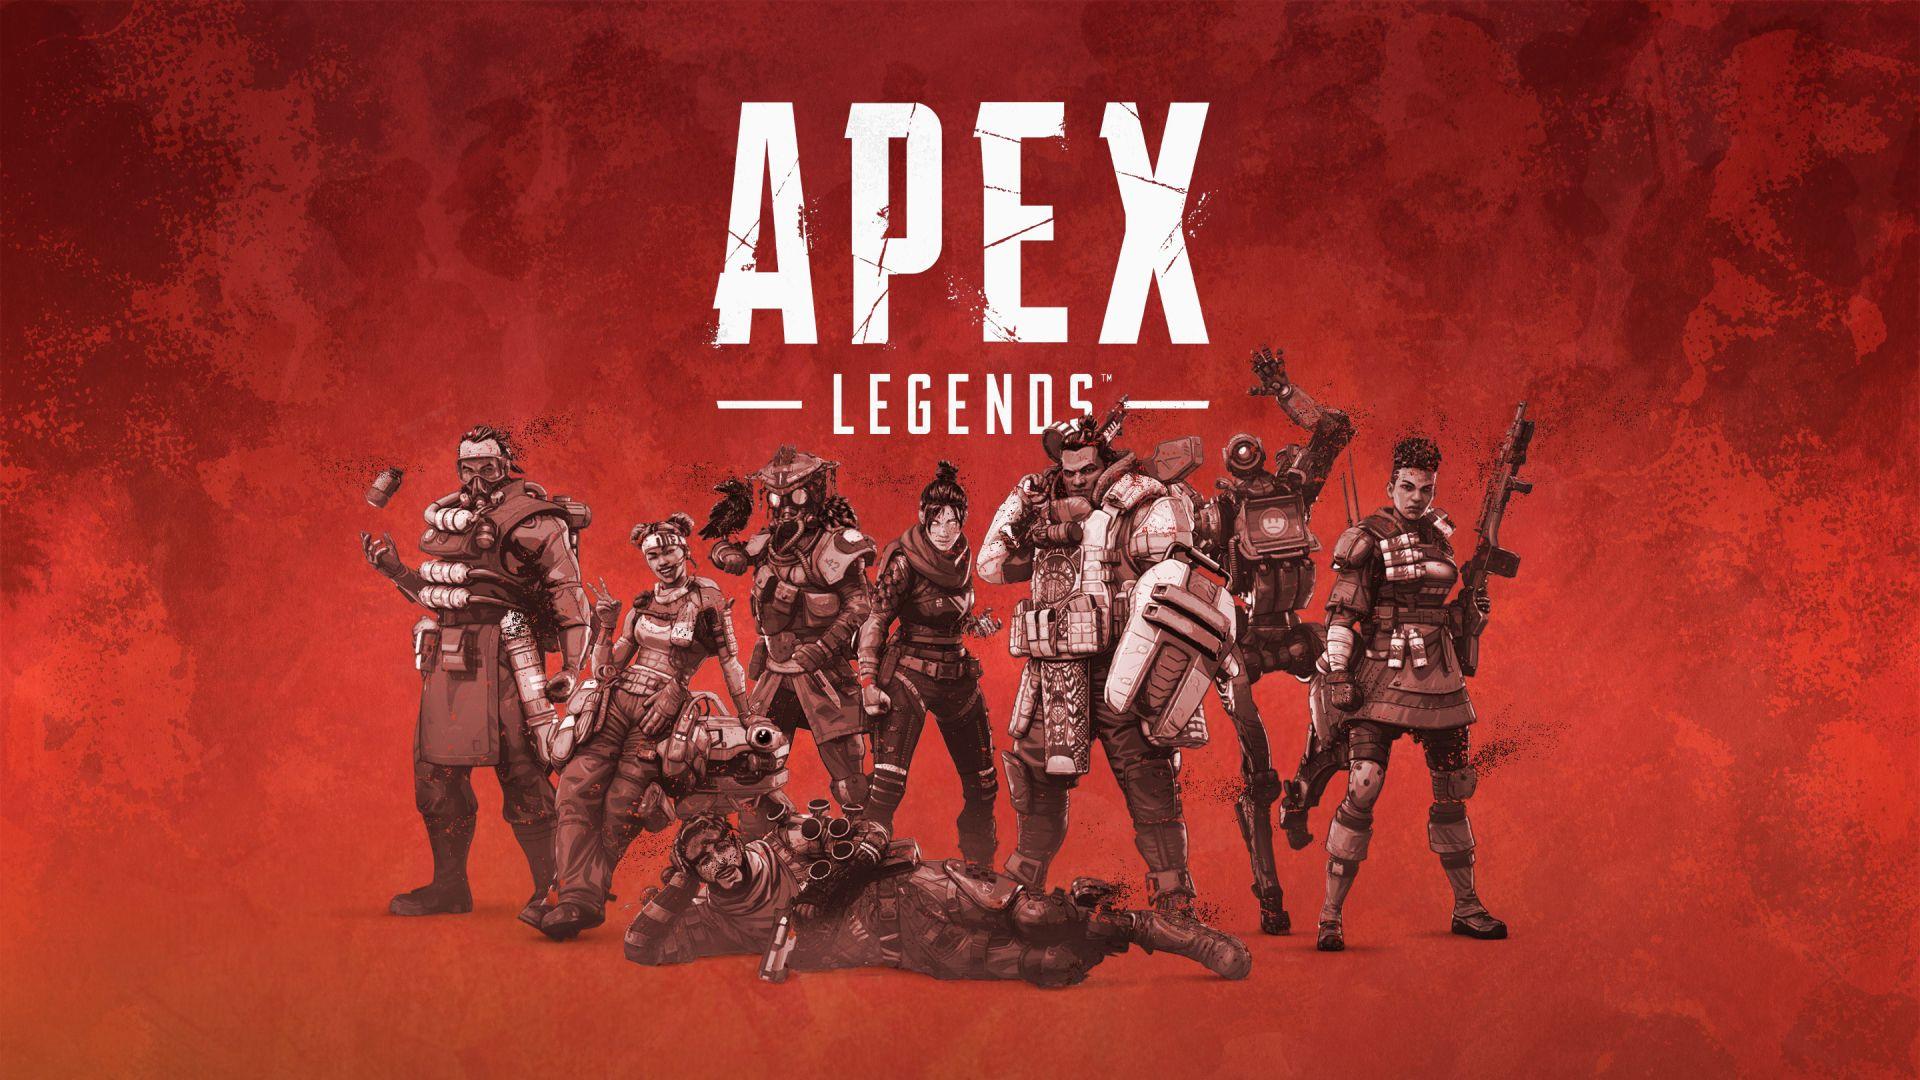 Apex Legends Wallpapers 1080p Wallpaper Cart In 2020 Hd Wallpaper Cool Wallpapers For Phones Game Art